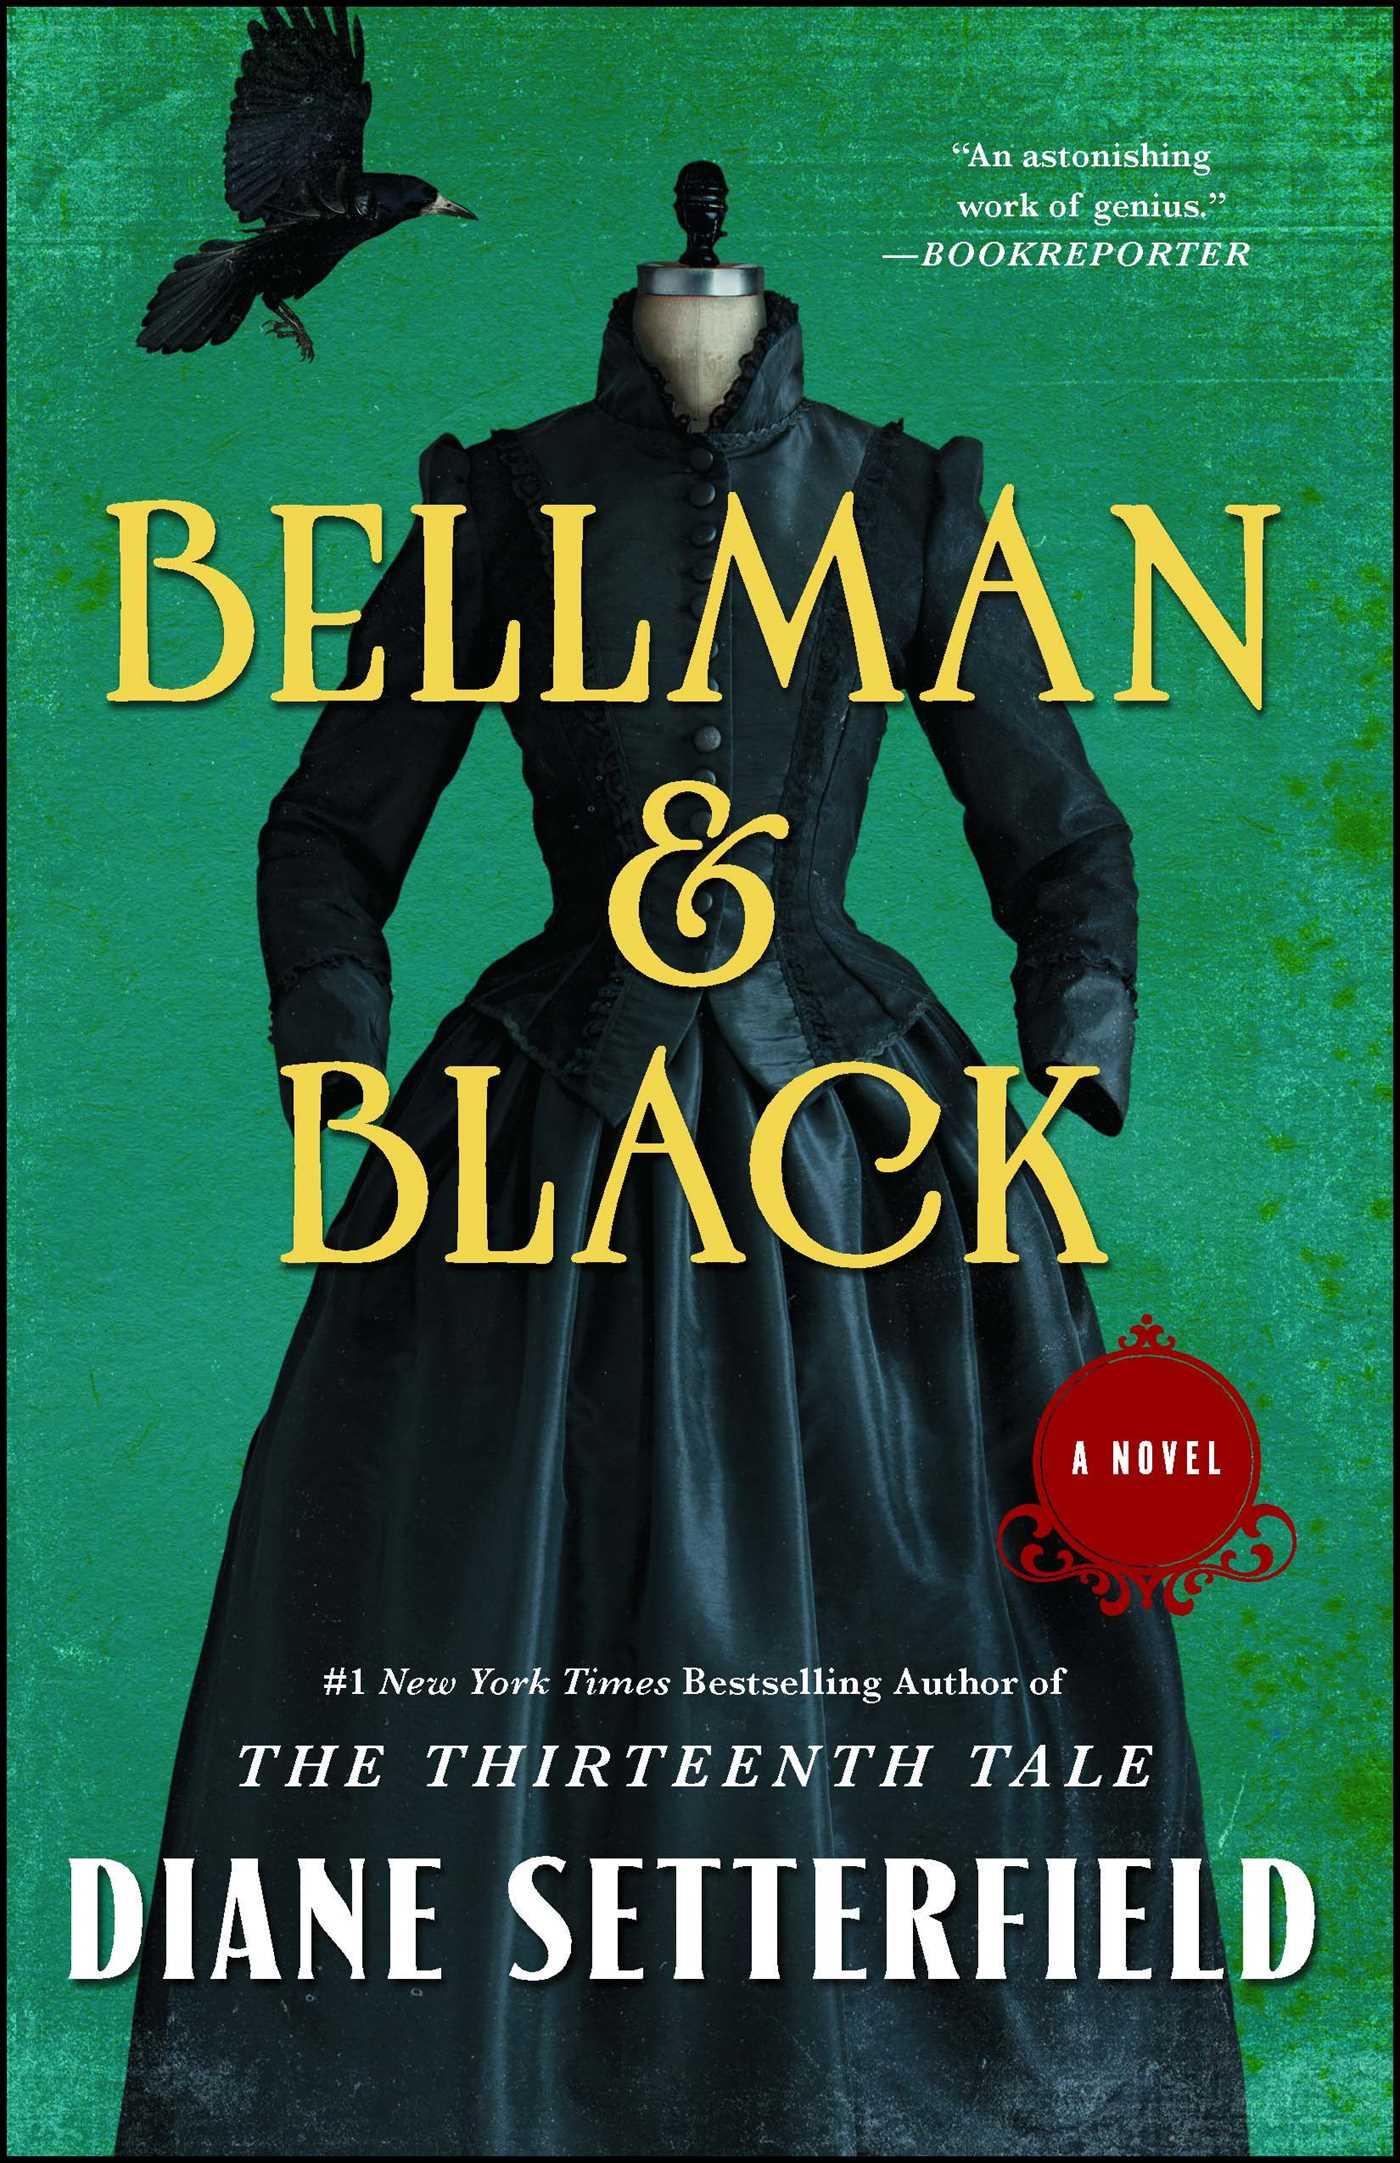 Bellman black 9781476711997 hr